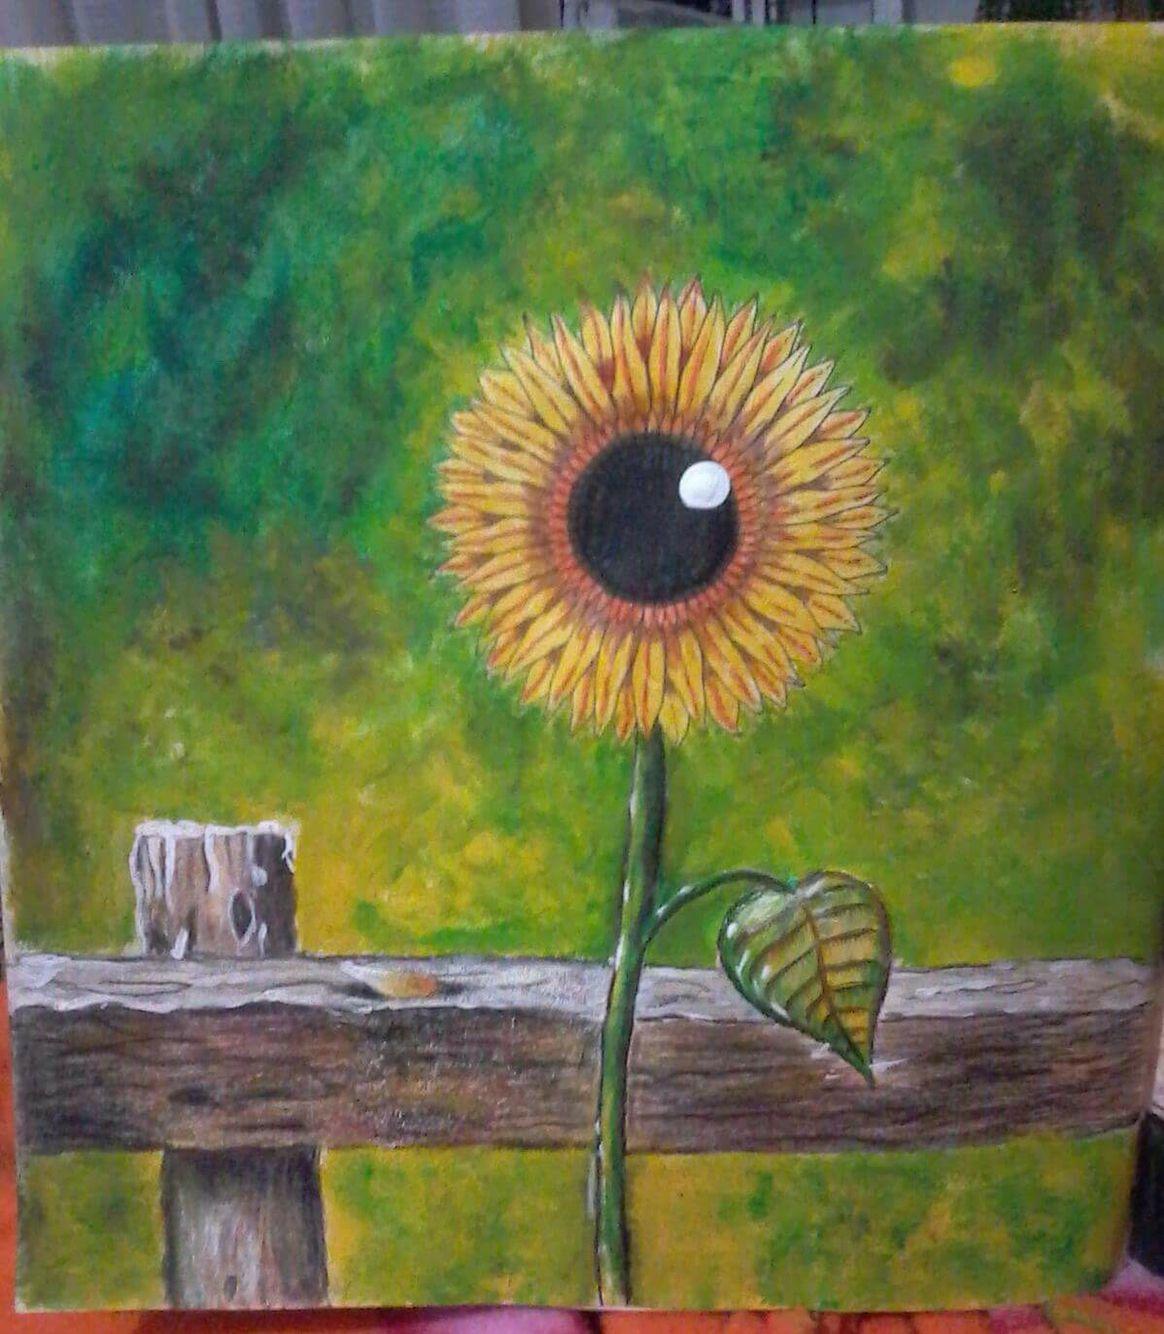 Sunflower Secret Garden Girassol Jardim Secreto Johanna Basford Coloring BooksAdult